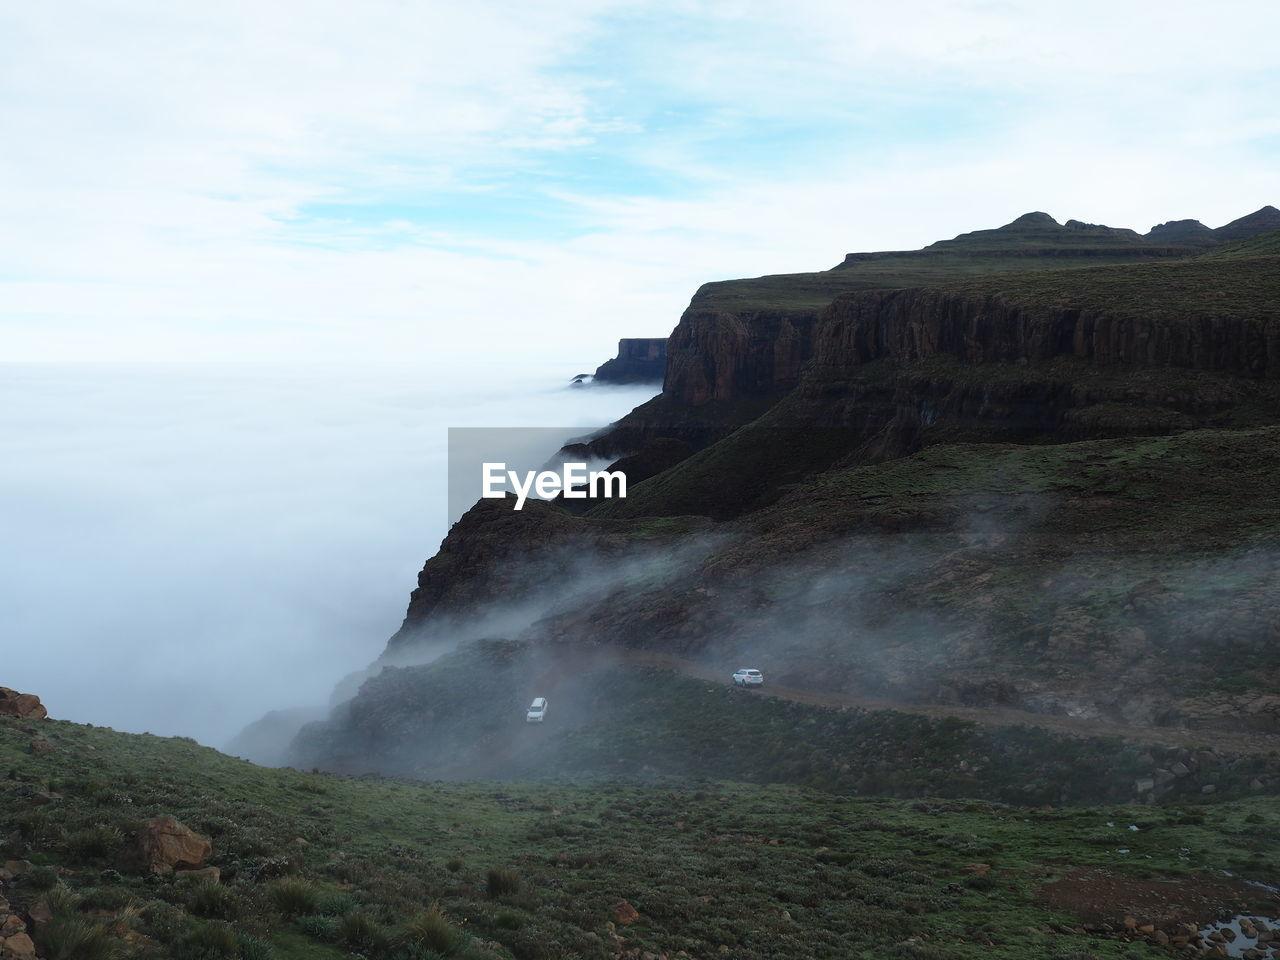 Sani pass and the fog